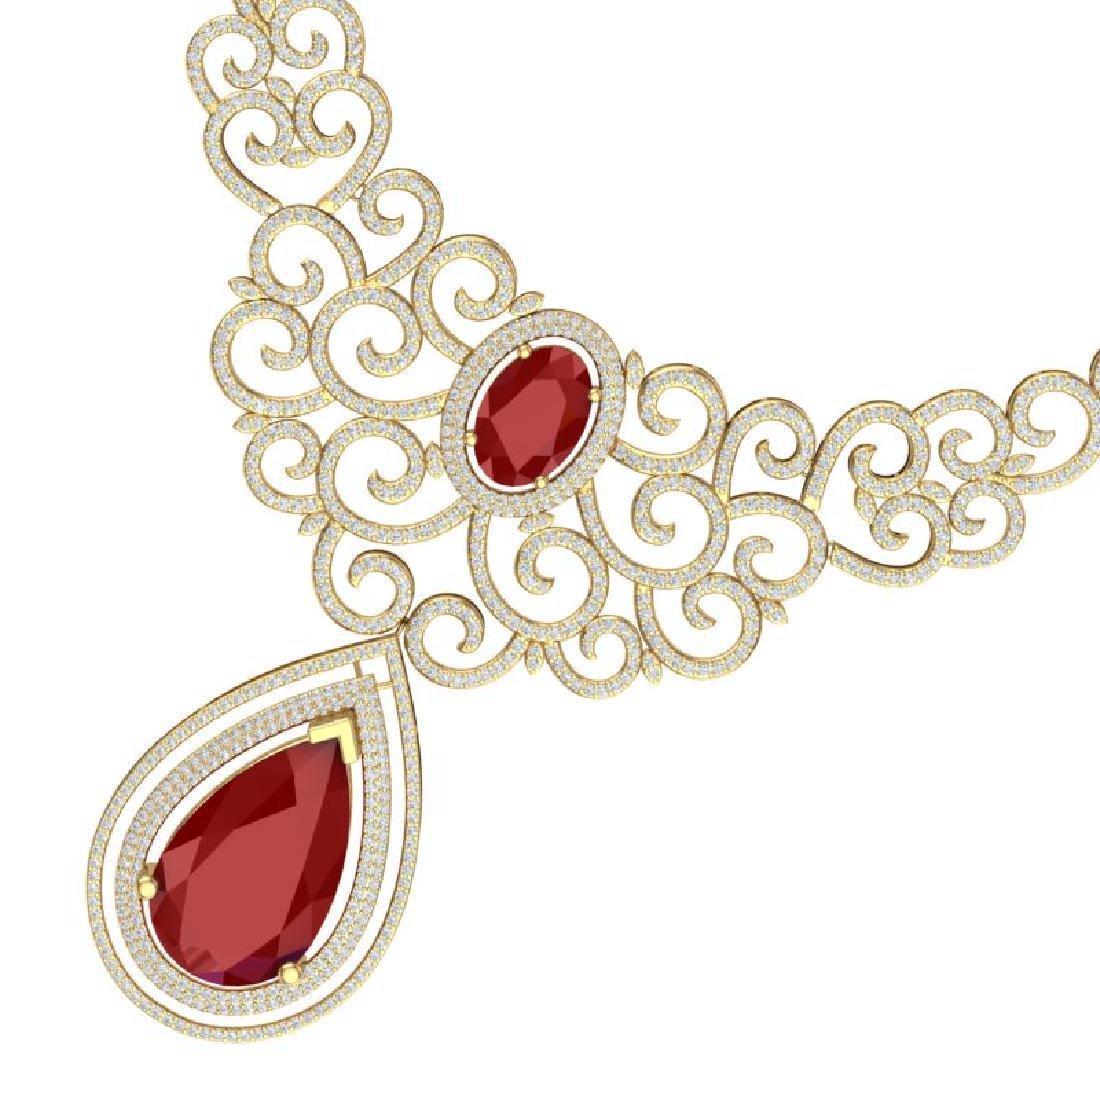 87.52 CTW Royalty Ruby & VS Diamond Necklace 18K Yellow